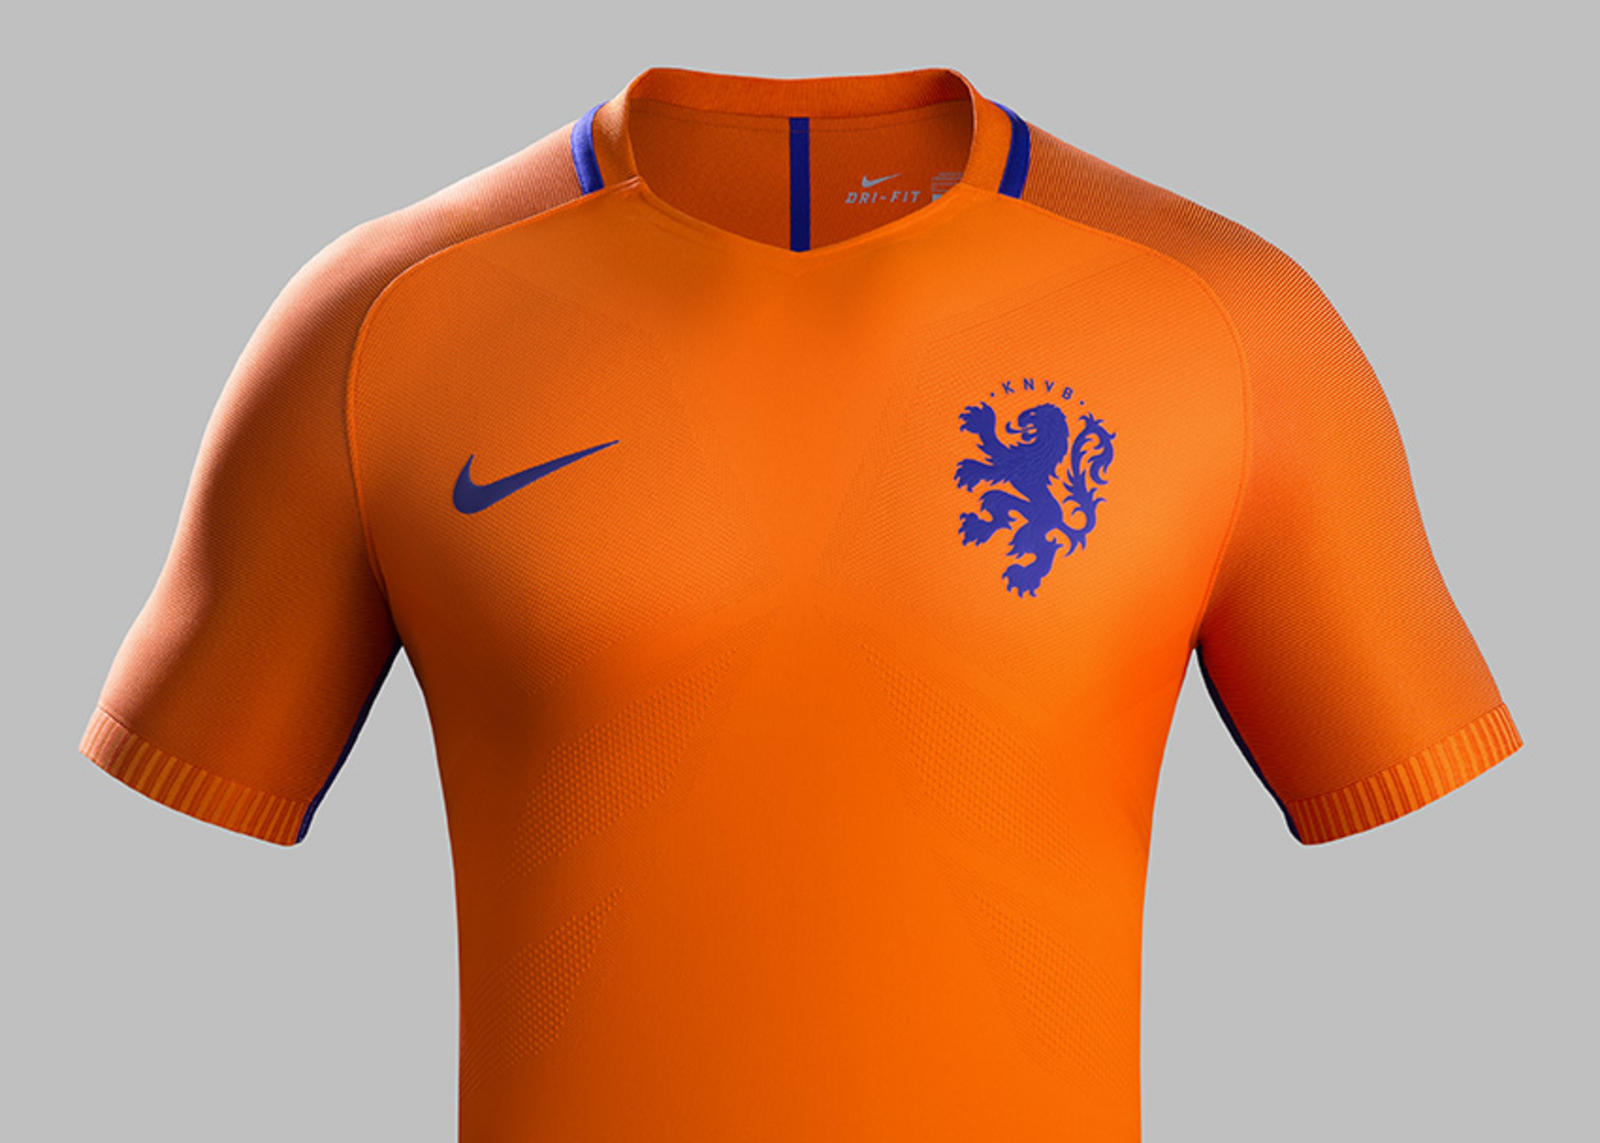 3868613c4 Football The National Nike Netherlands News Kits 2016 vrtOwr